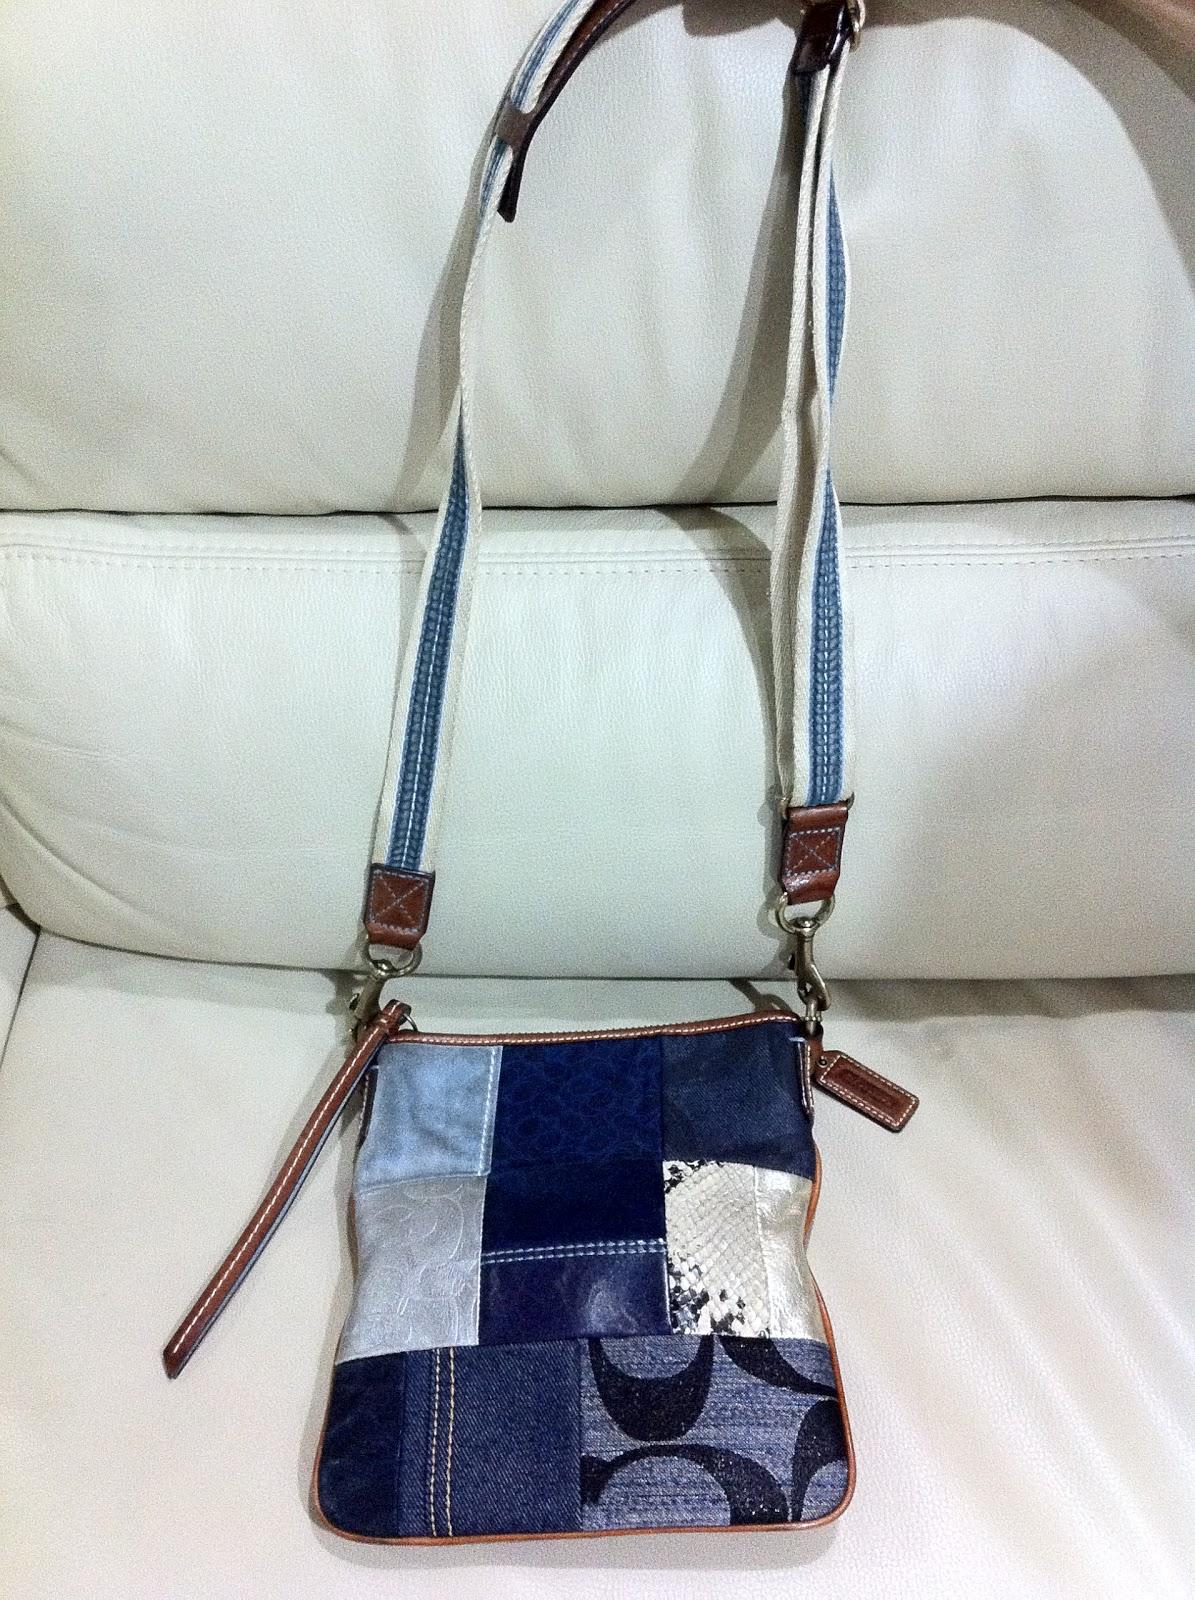 Bagscapade: Authentic COACH Denim Patchwork Sling Bag